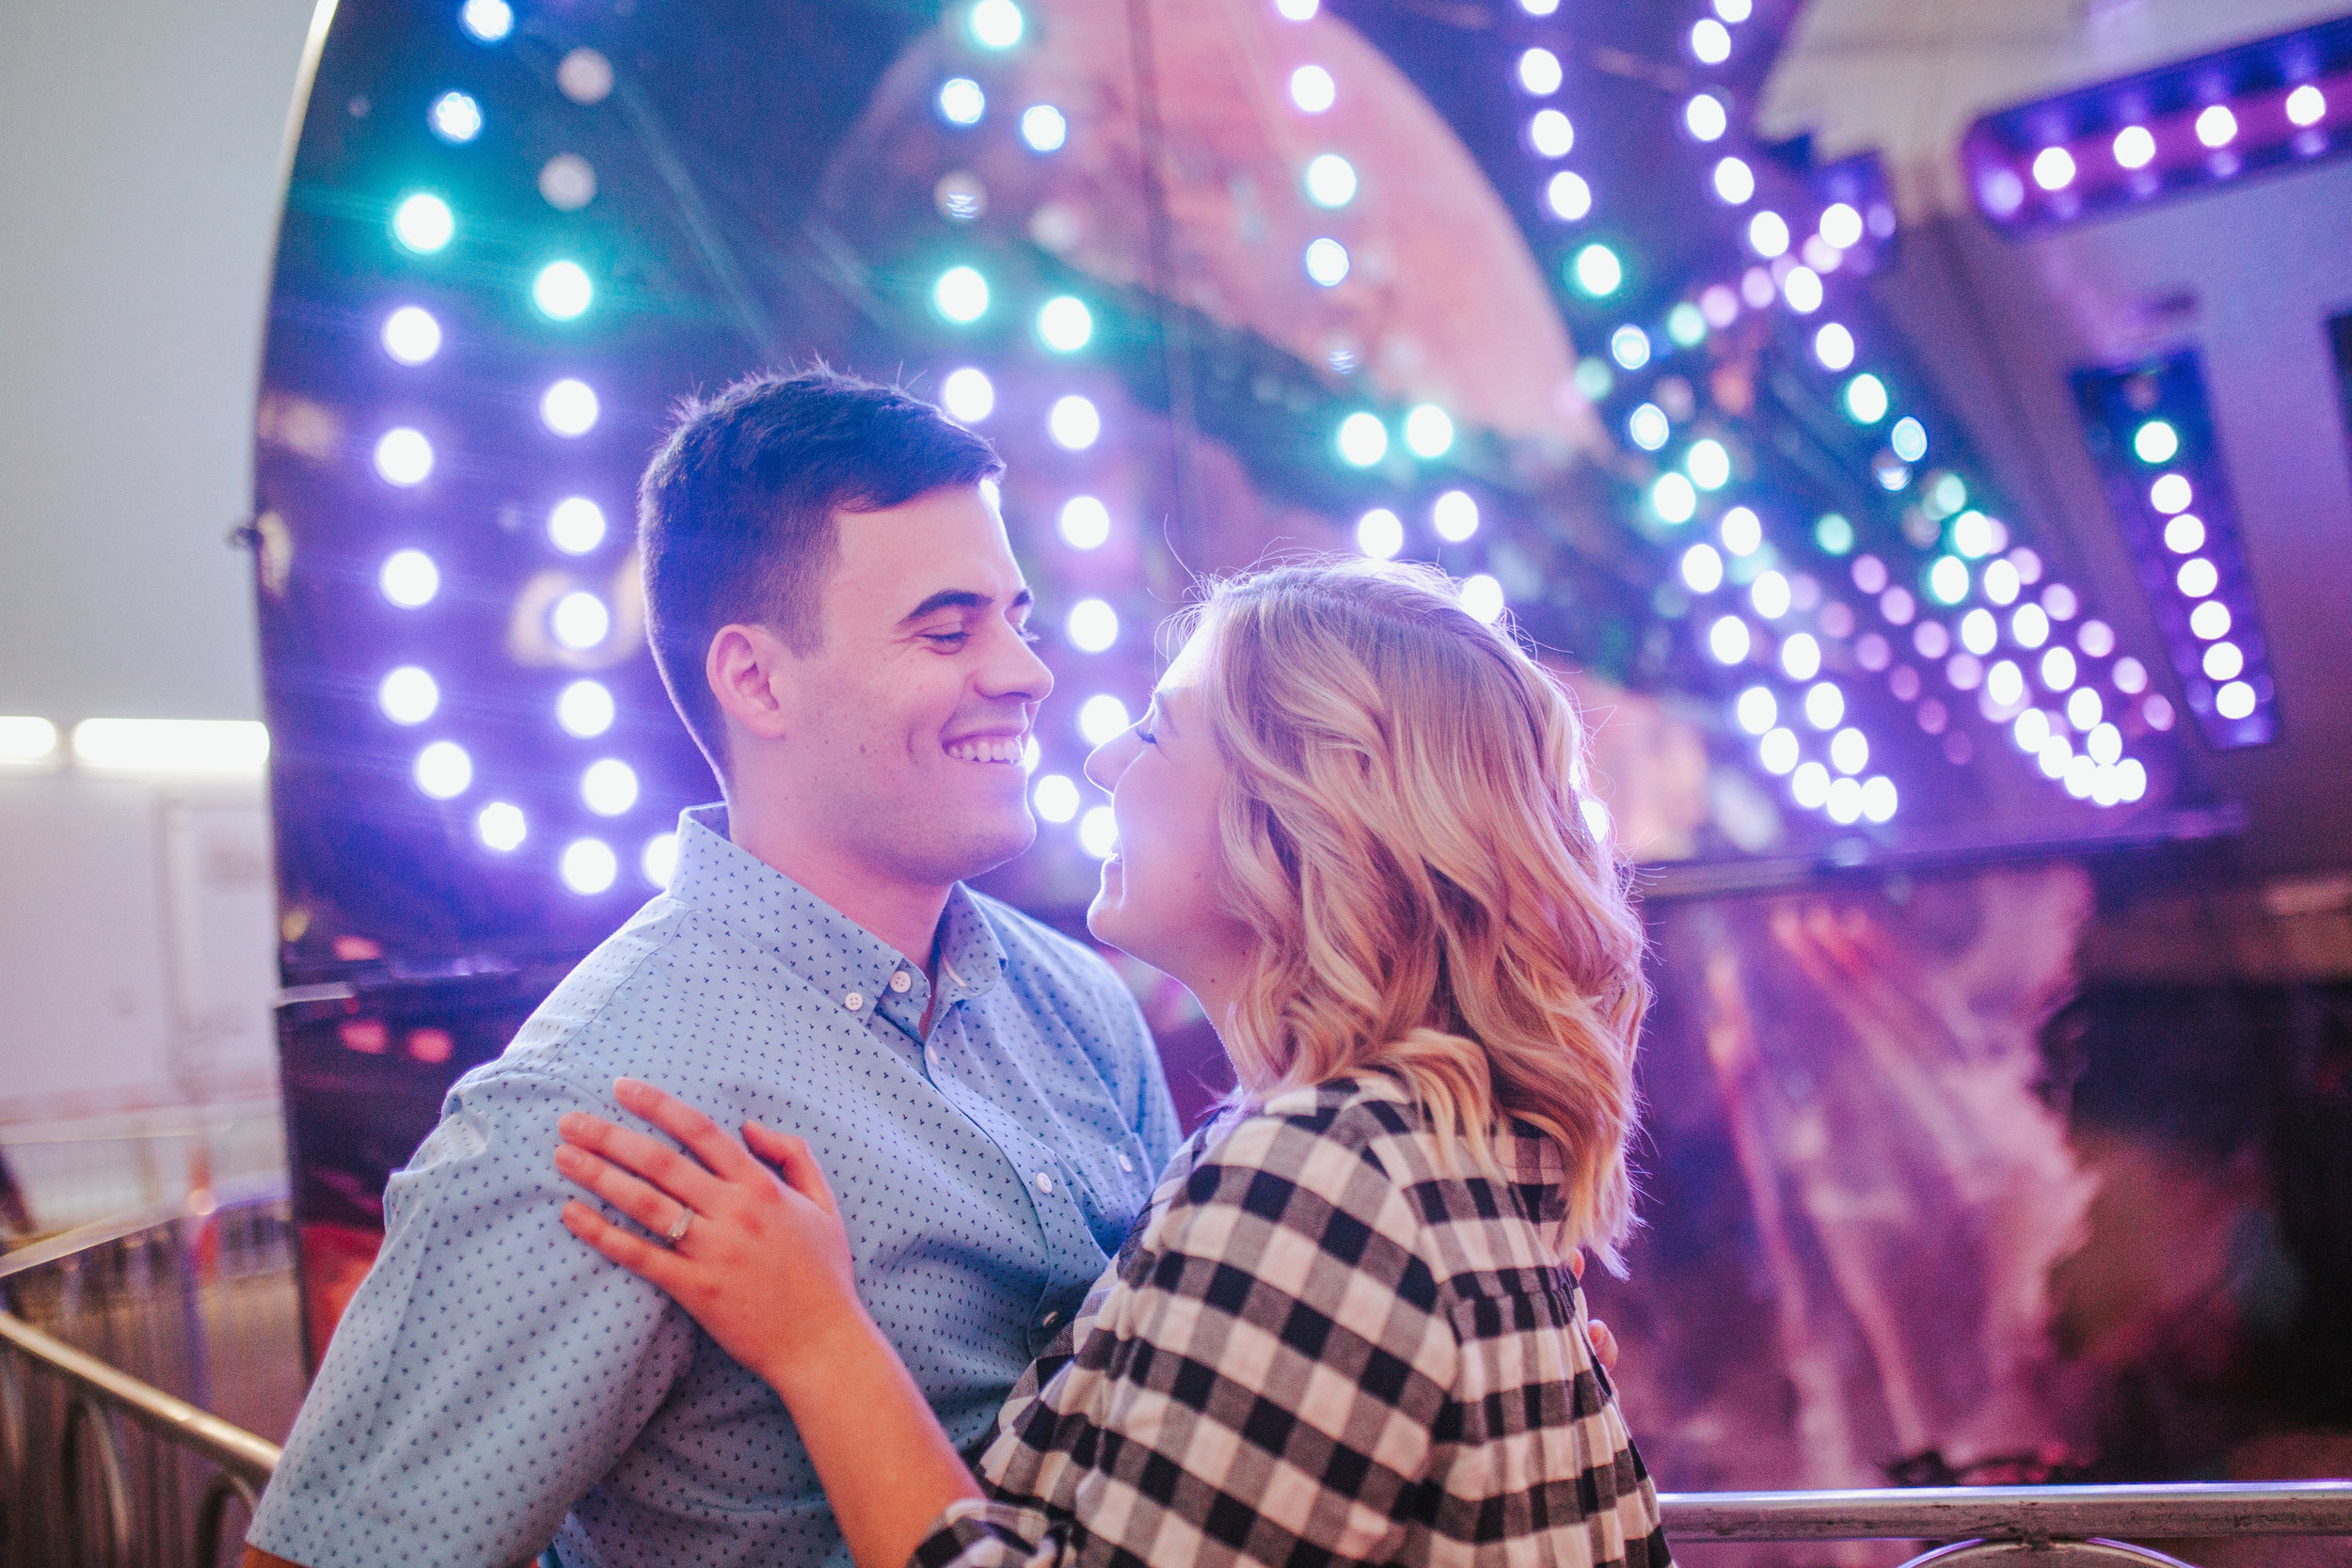 Morgan + Cody Minisession Lookforthelightphotovideo carnival engagements (108 of 148).jpg